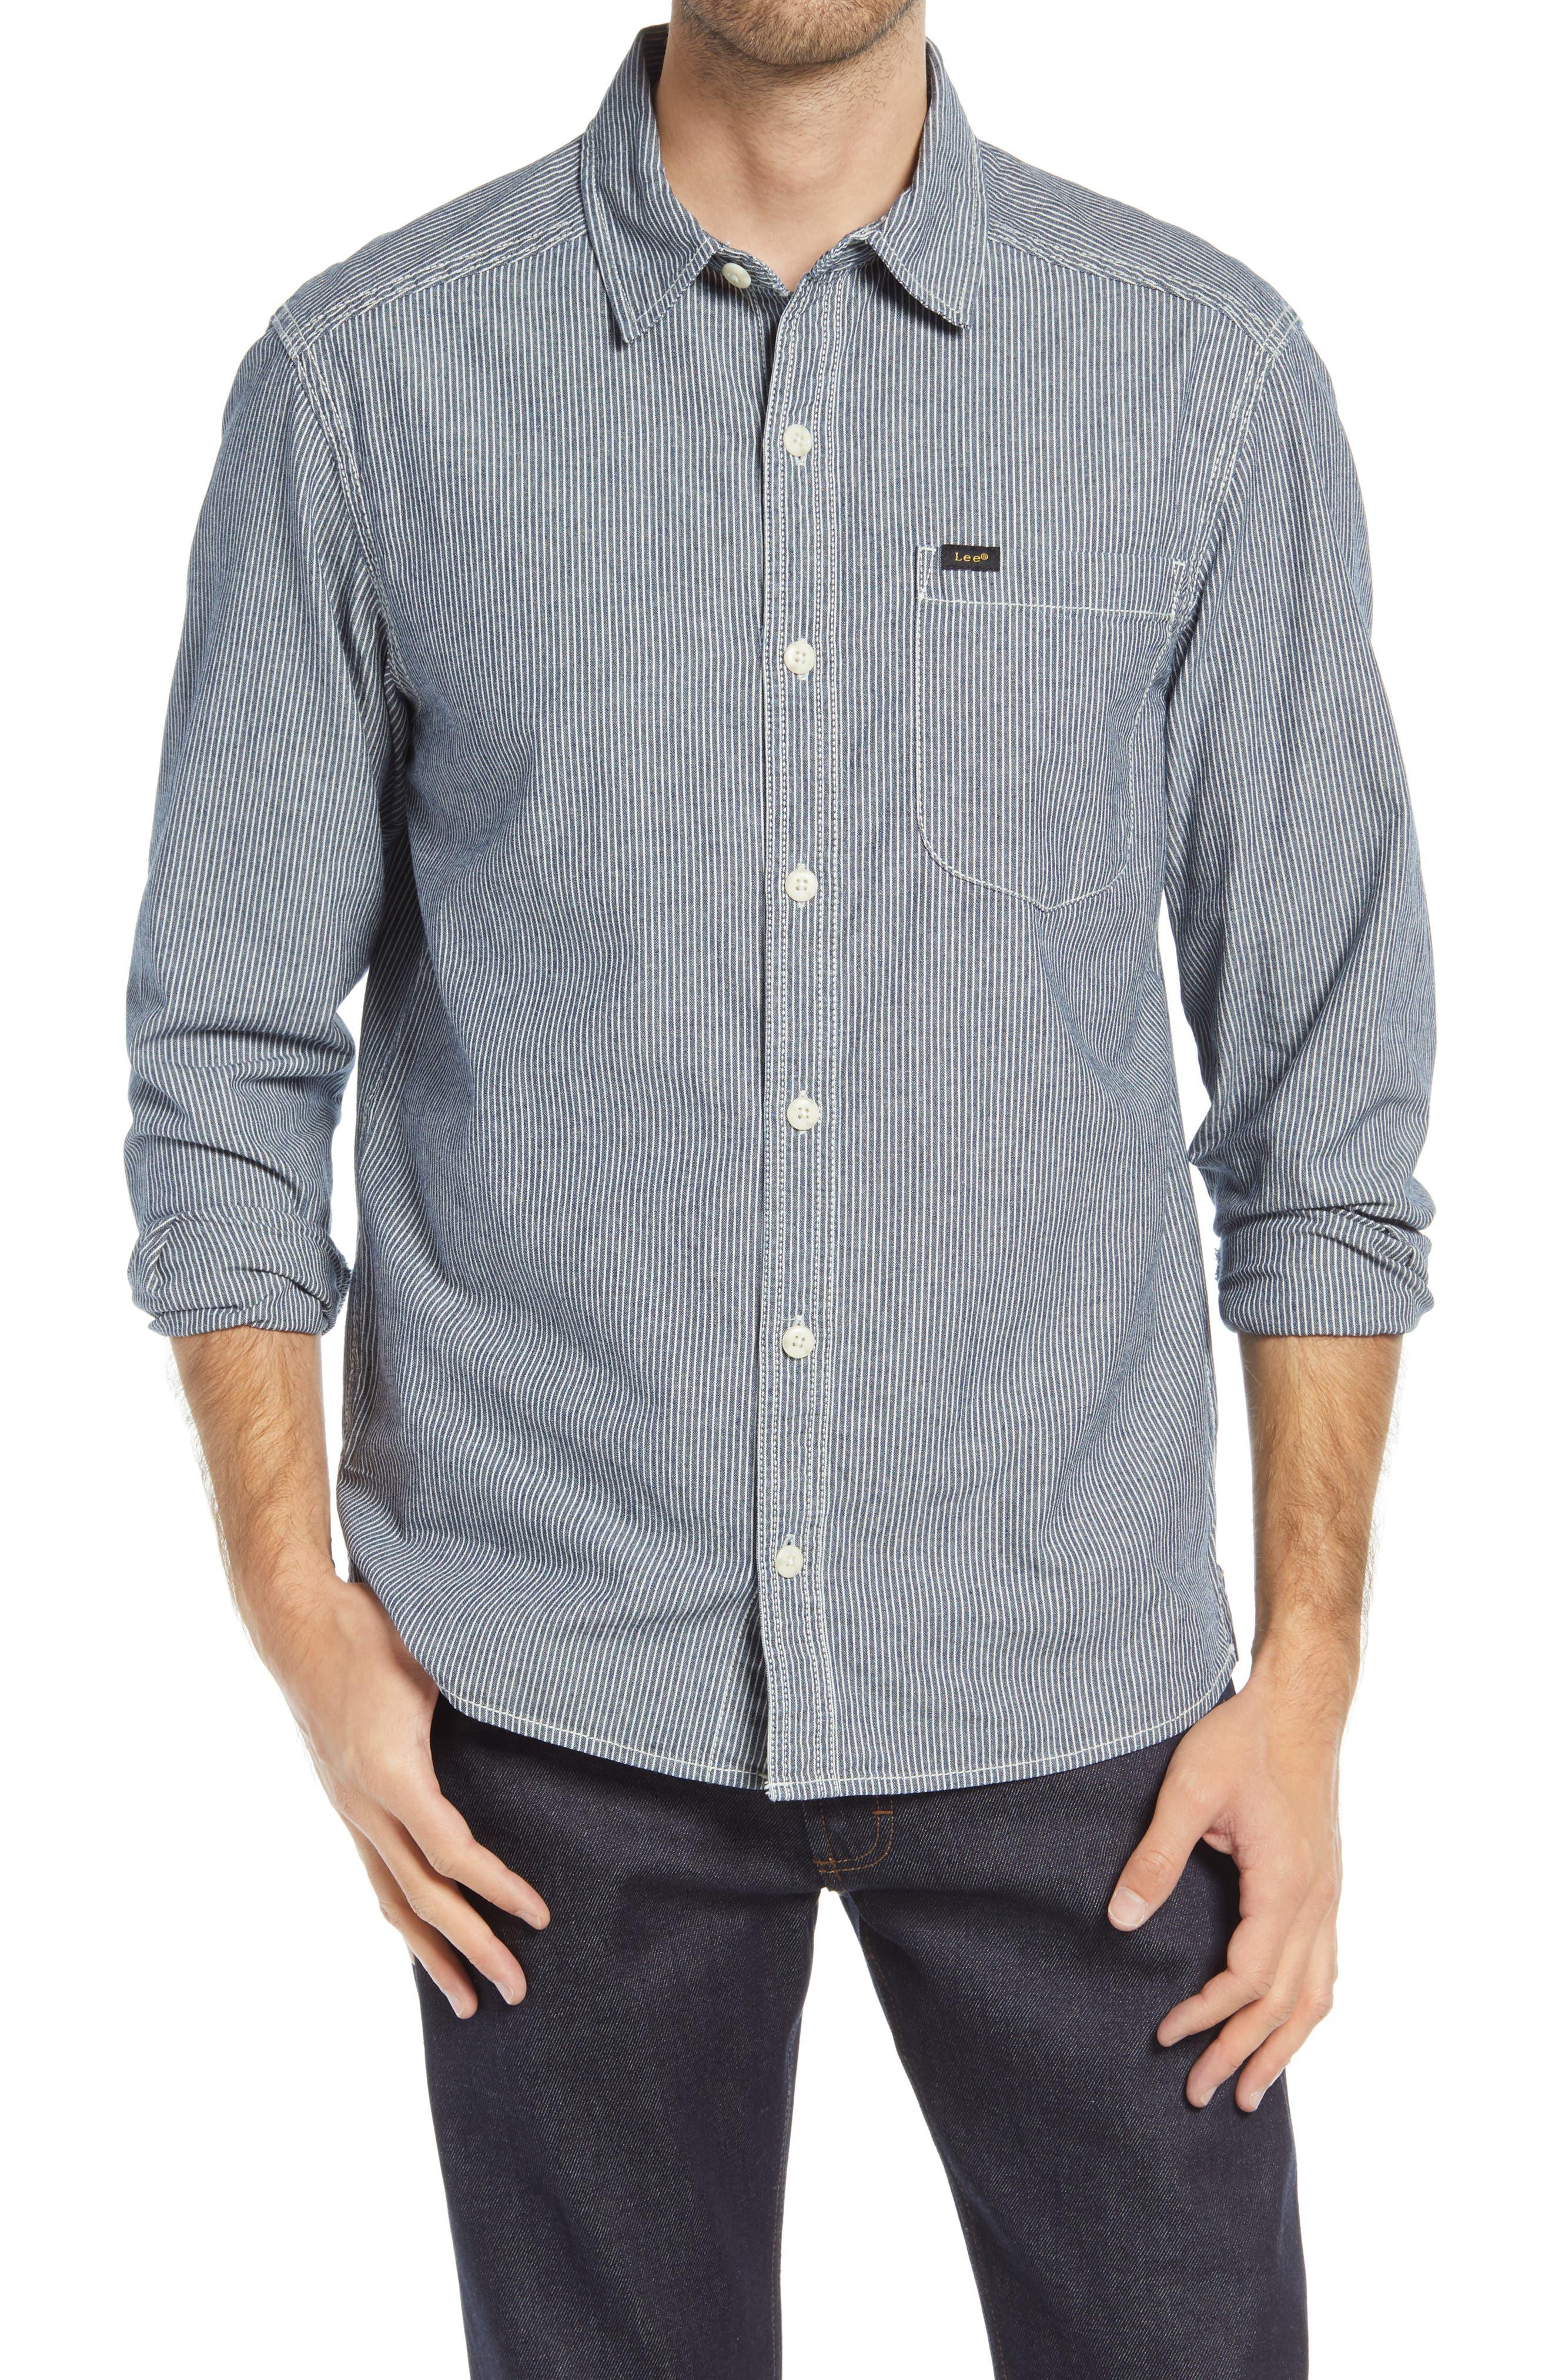 Engineer Stripe Button-Up Shirt